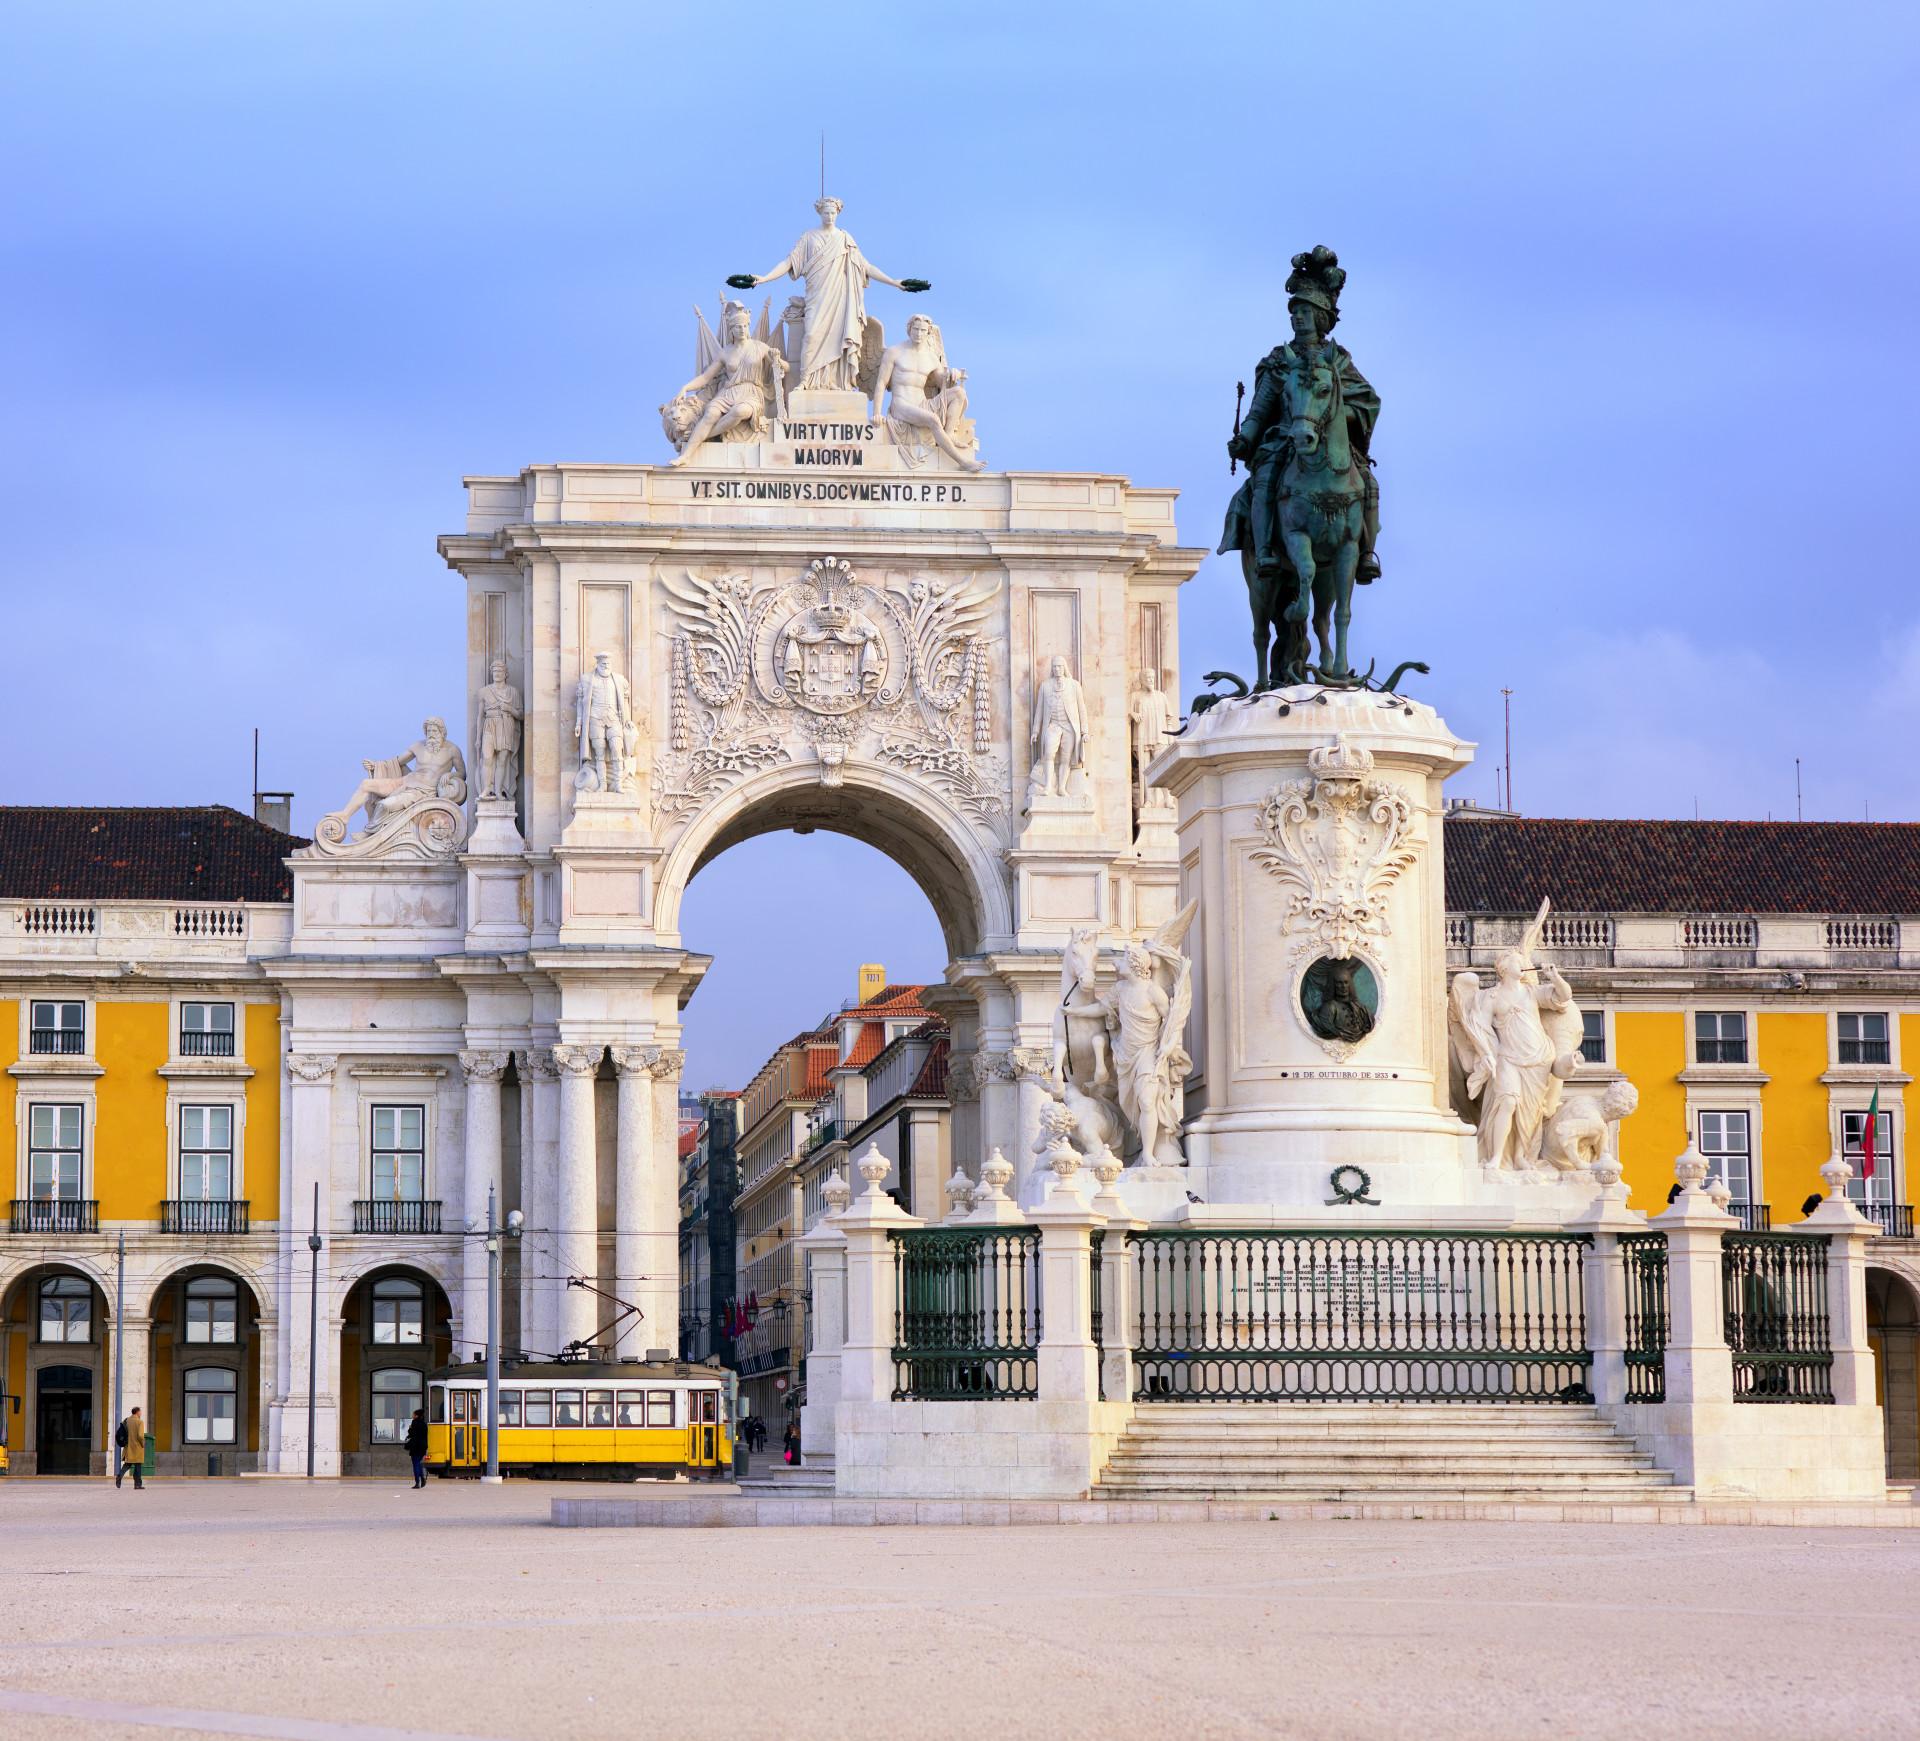 Het Praça do Comercio in Lissabon